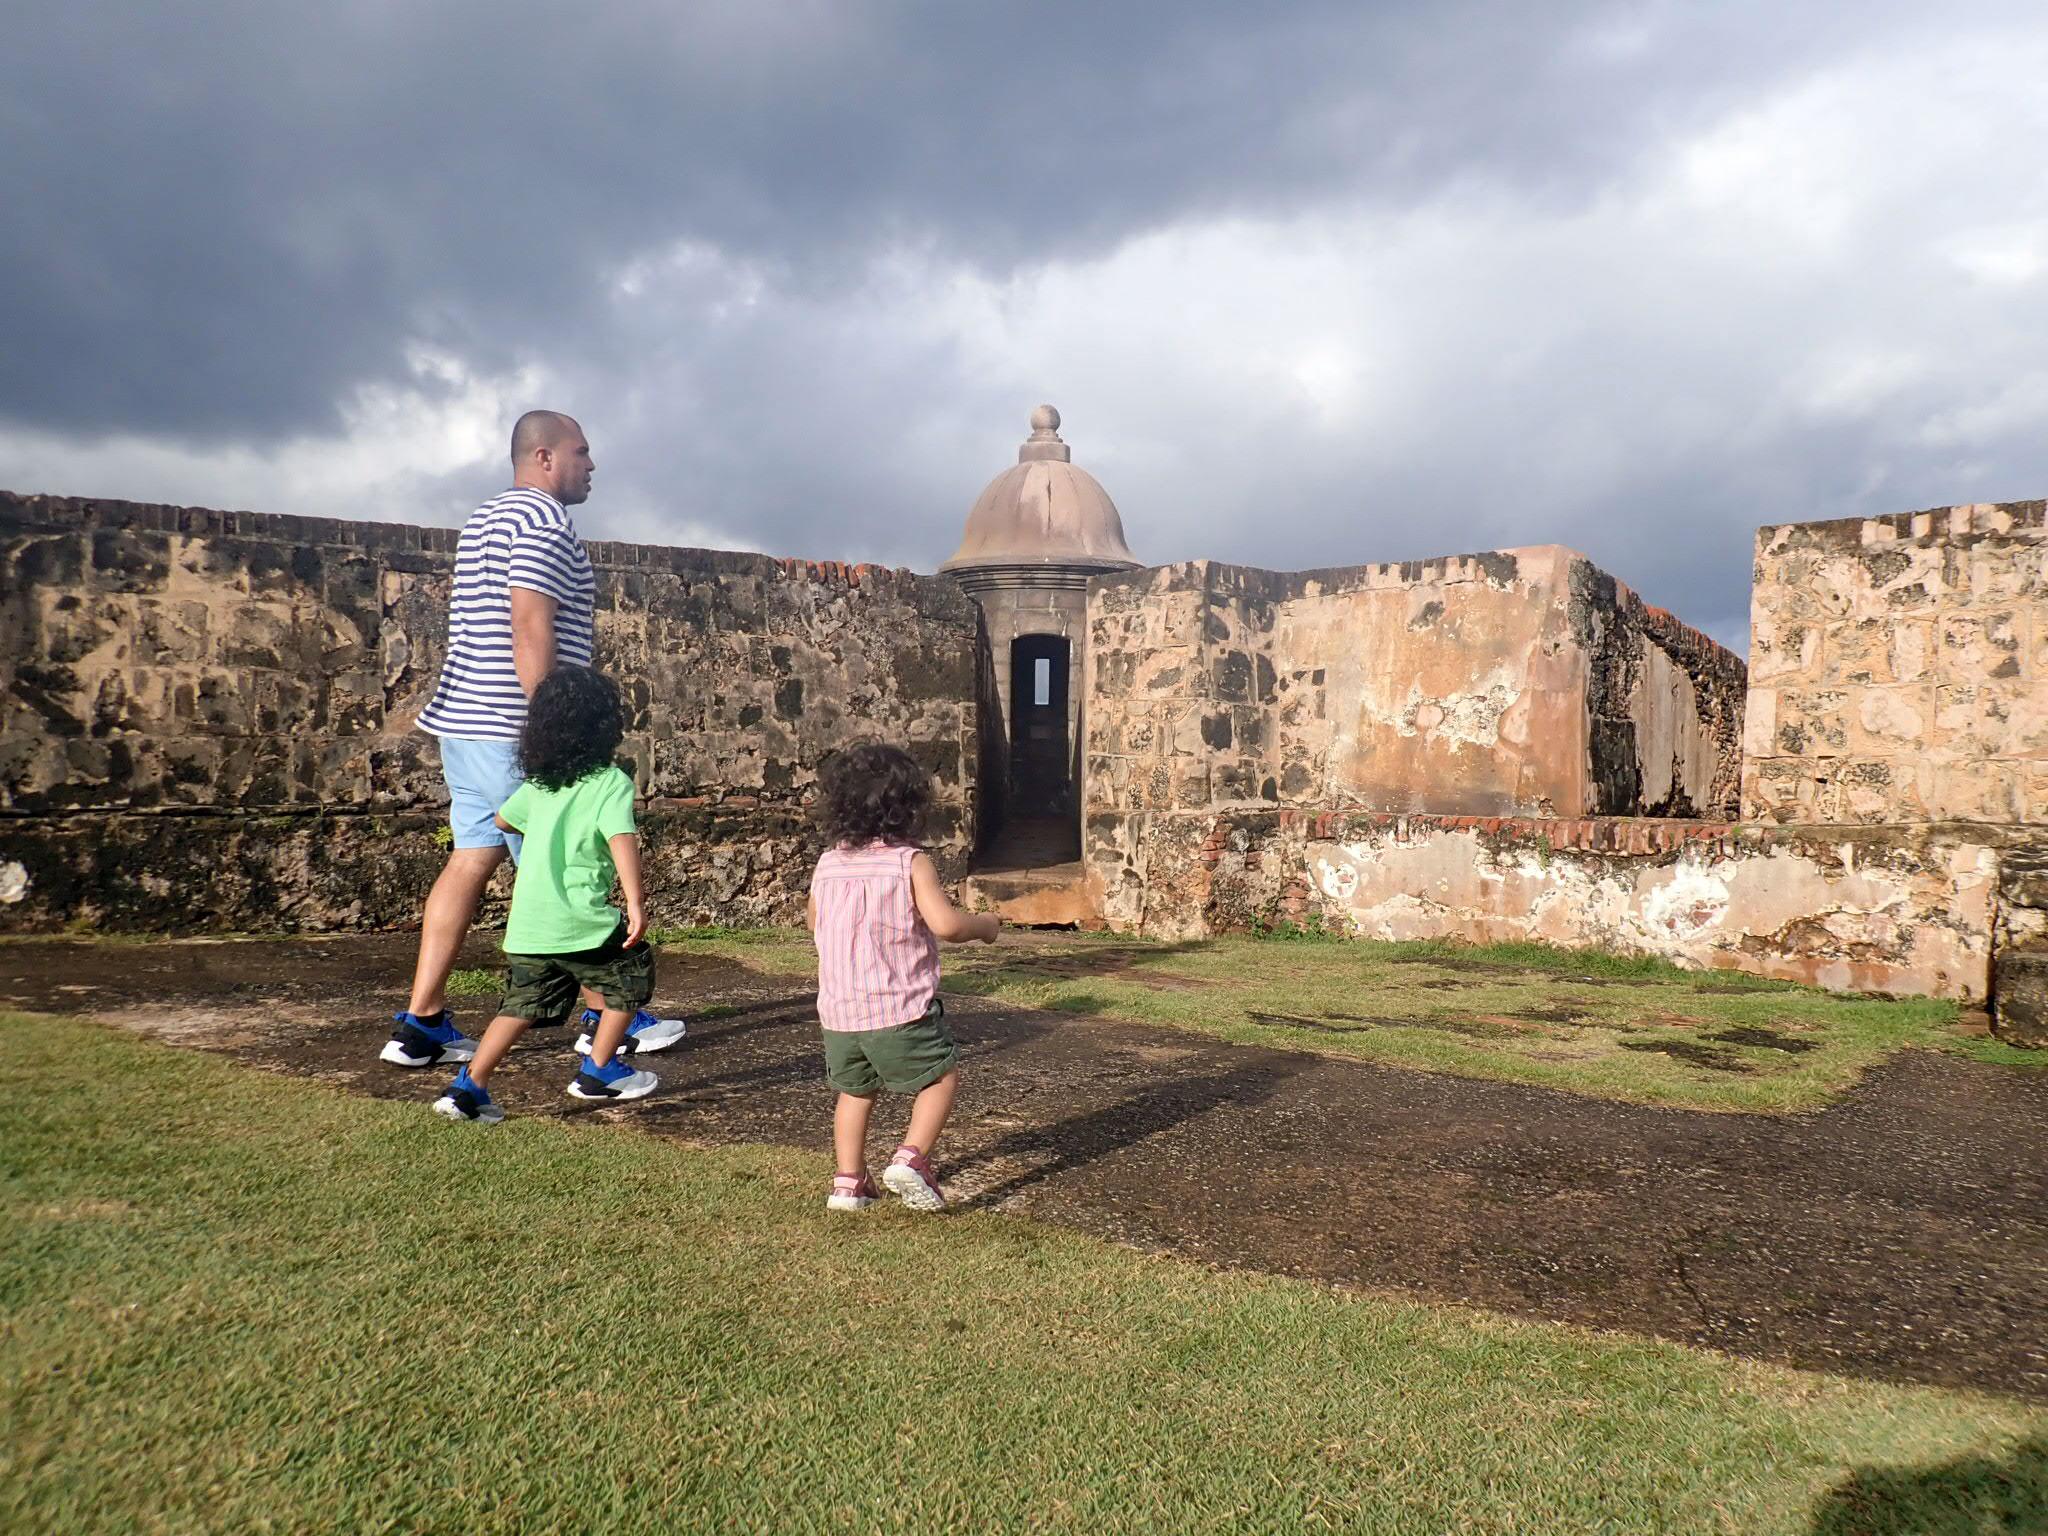 Castillo San Cristobal   Fort San Cristobal   Old San Juan   Viejo San Juan   Things to do Old San Juan   Things to do Viejo San Juan   Puerto Rico Things To Do   www.anajacqueline.com